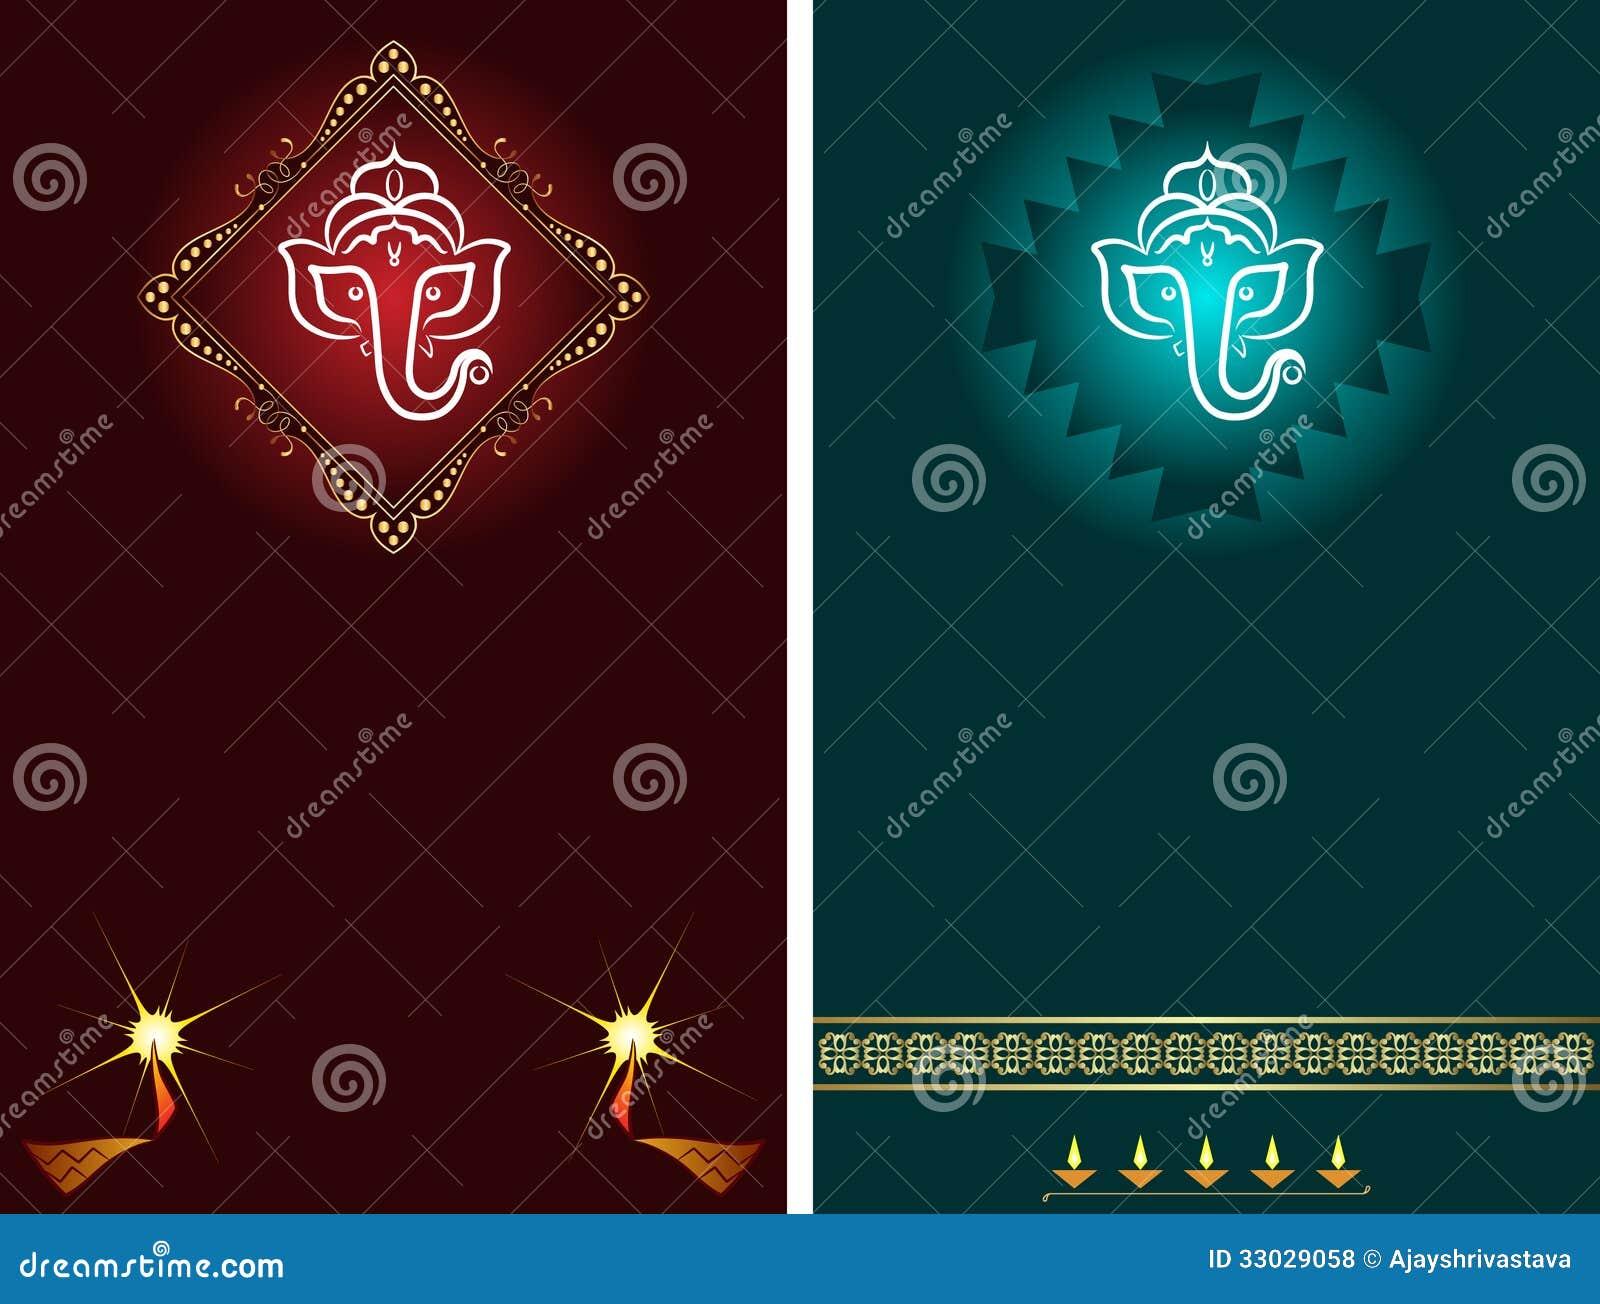 Diwali Greeting Card Designs Diwali Greeting Card Diwali Greeting